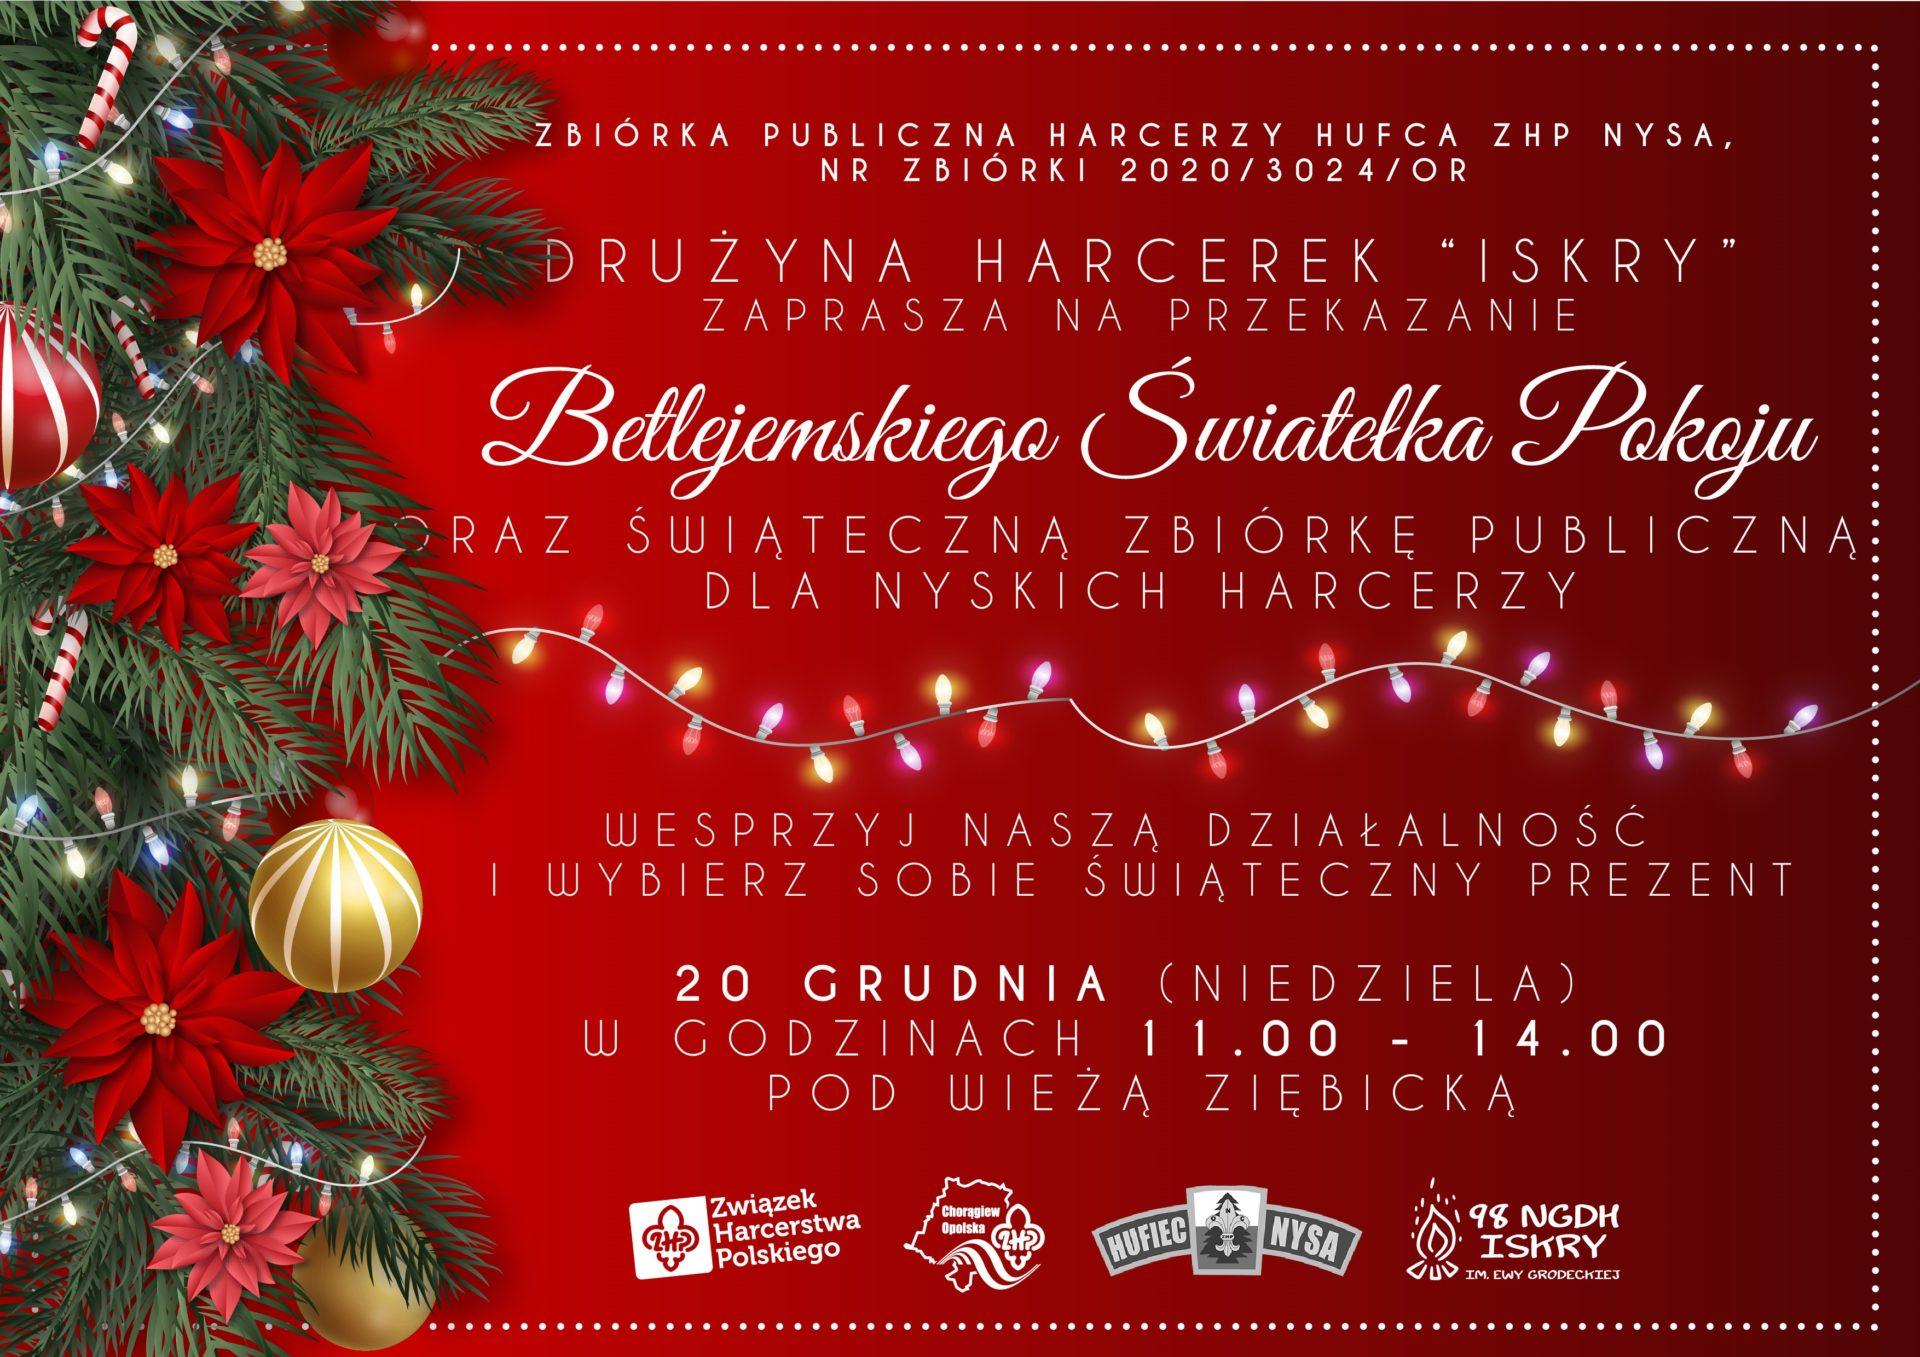 Zbiórka publiczna harcerzy Hufca ZHP Nysa